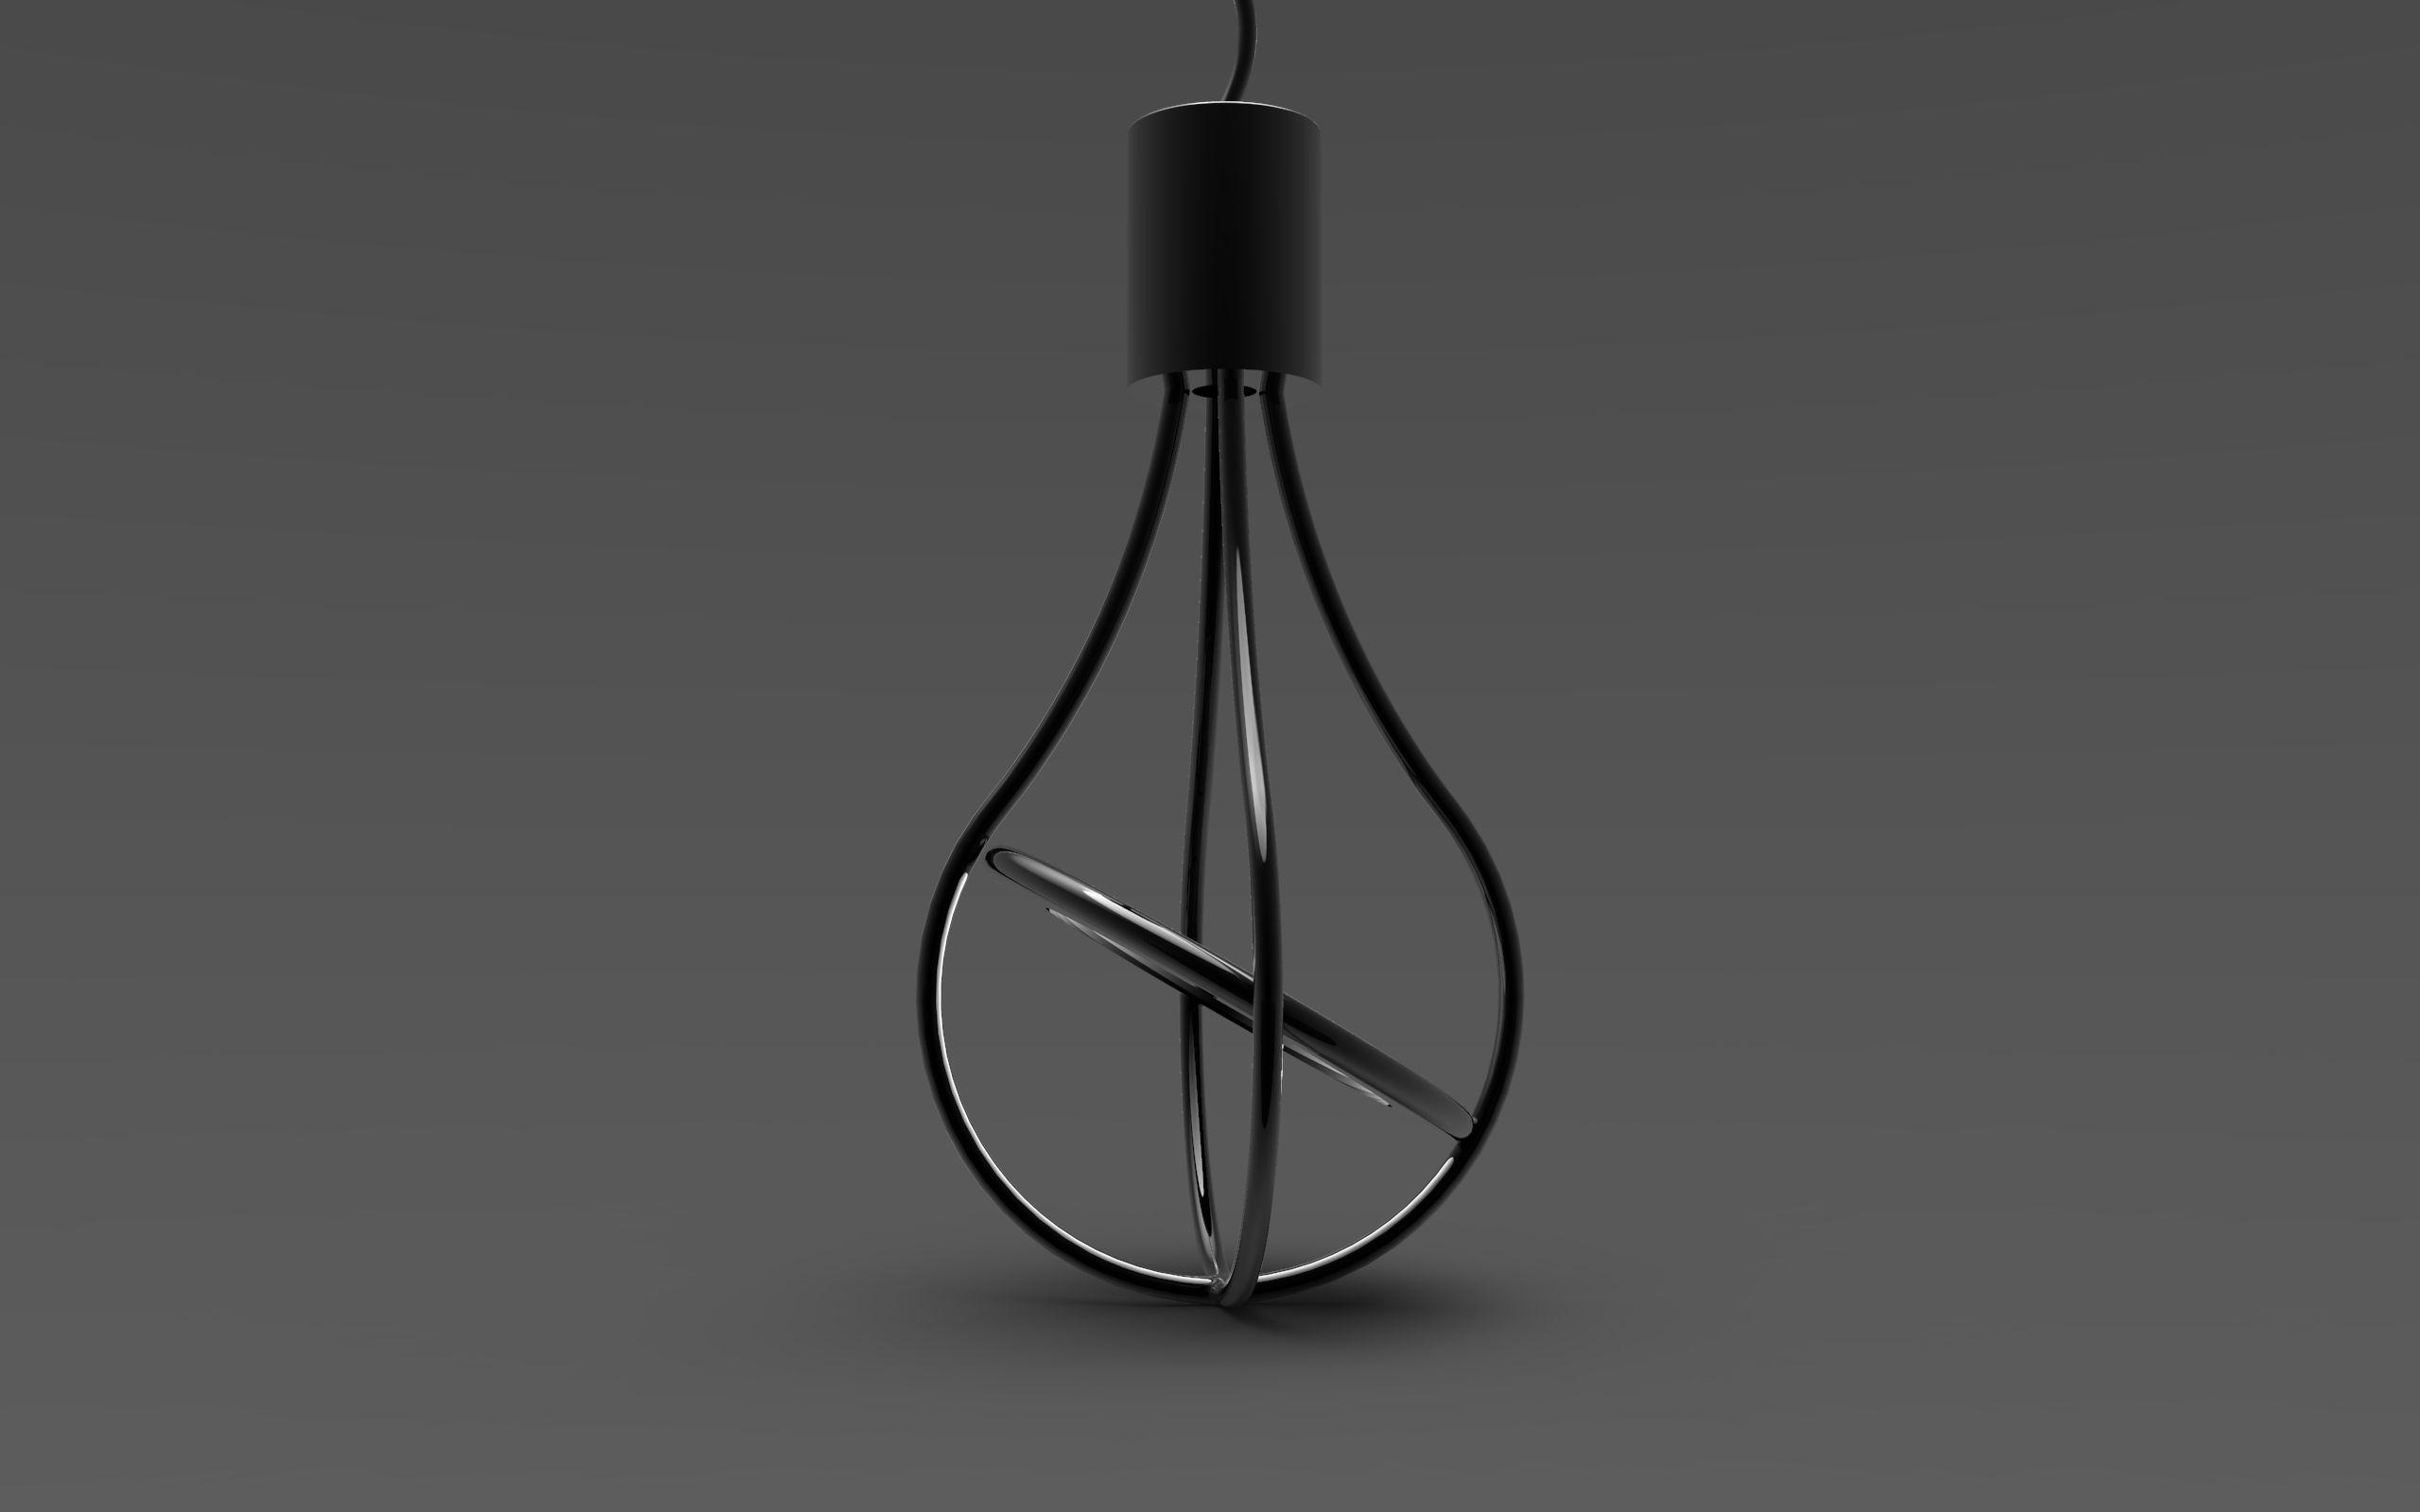 Lamp-l10f-pro3-3500-3500